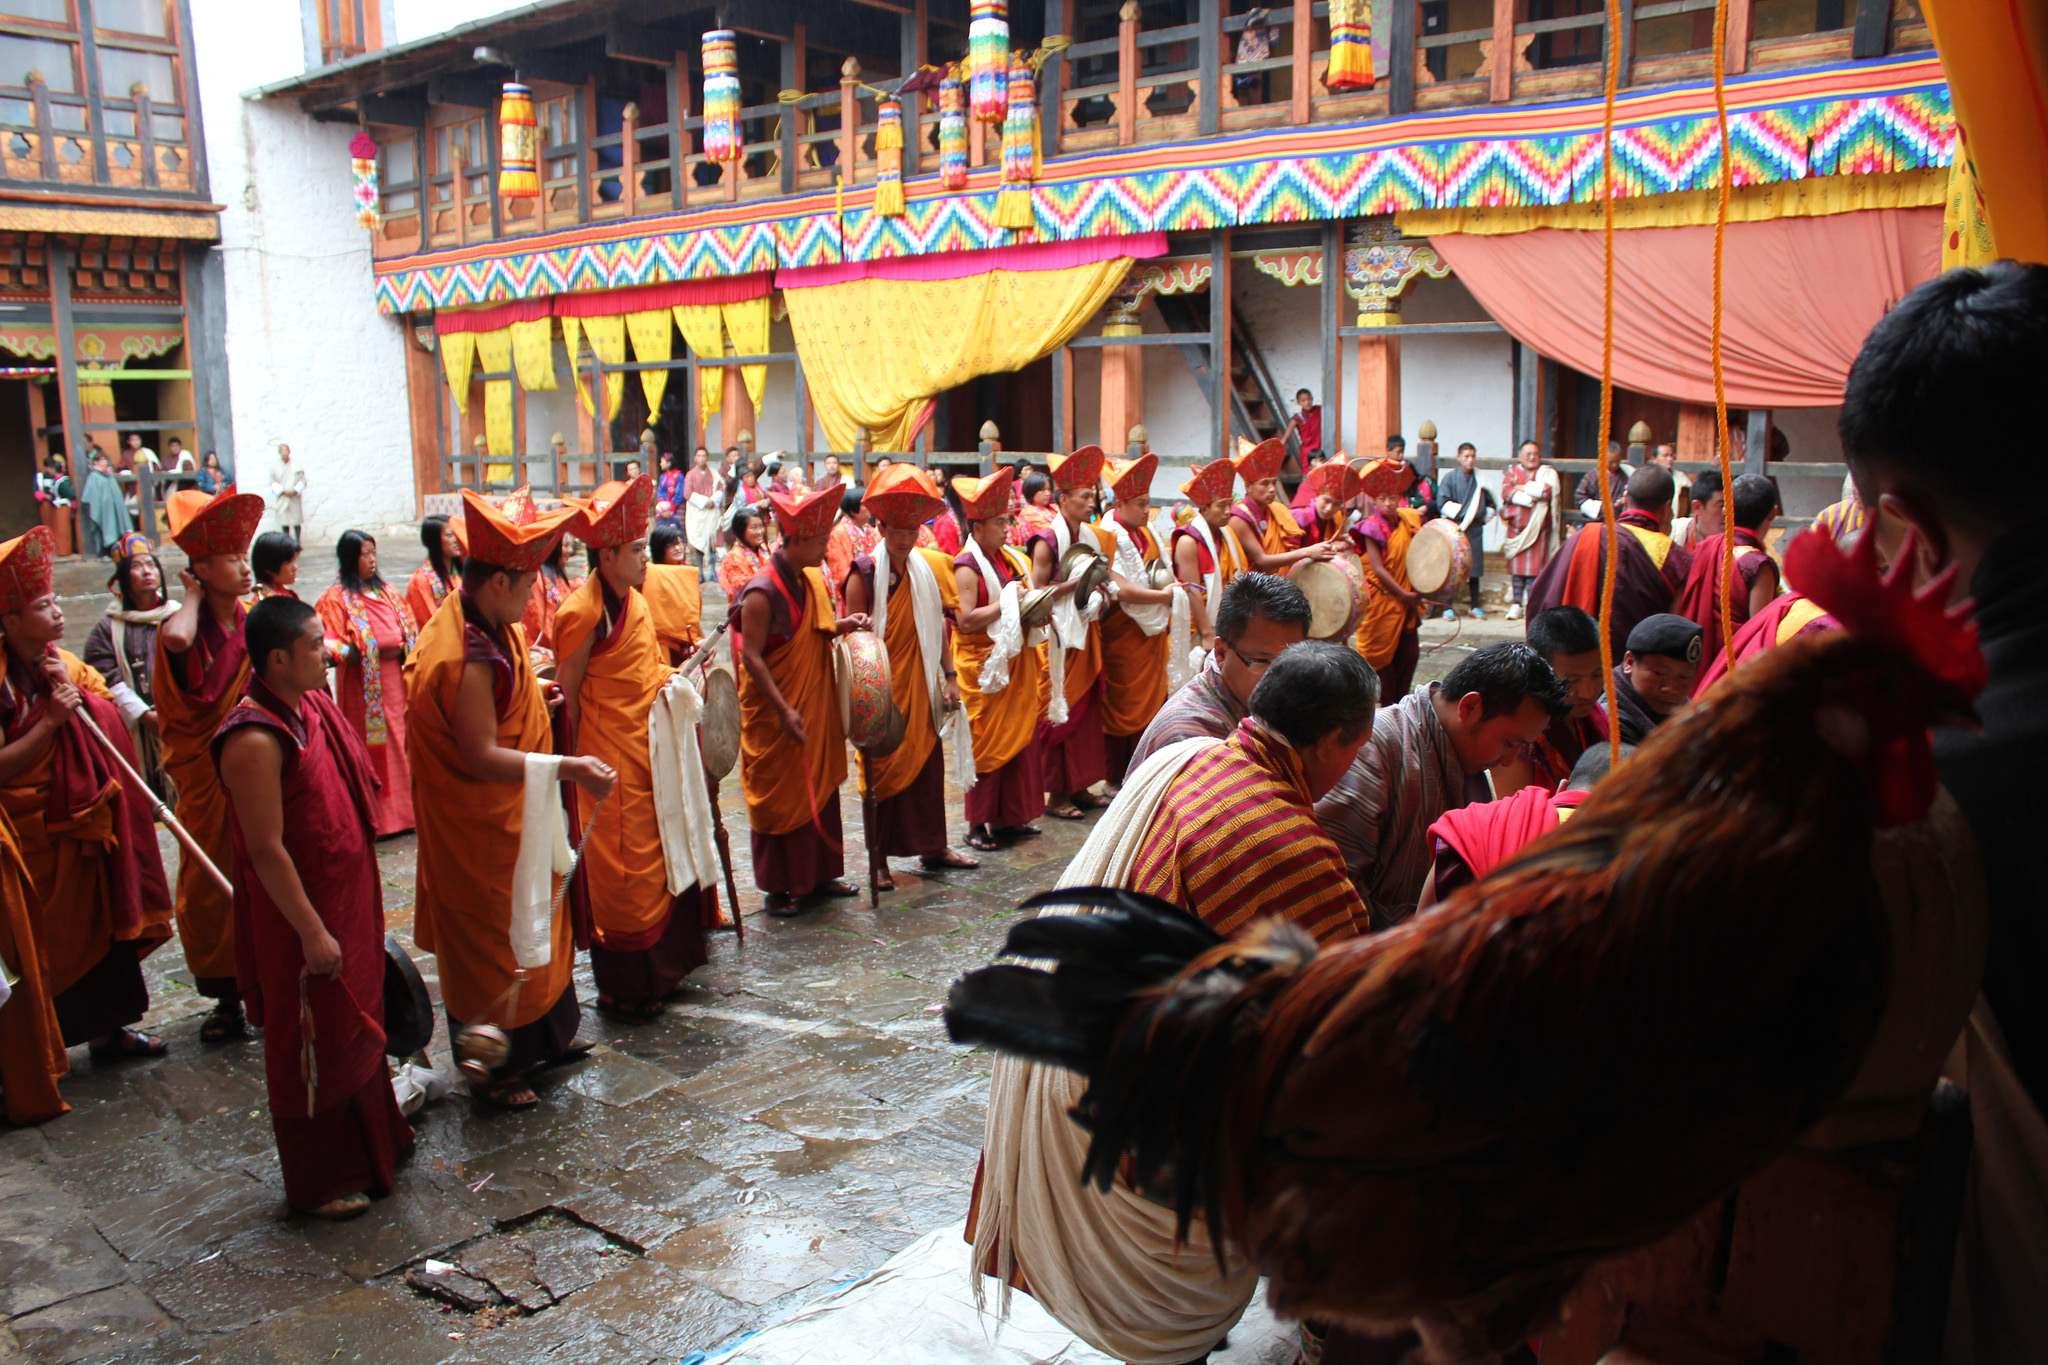 bhutan17 Bhutan   The Land of the Thunder Dragon